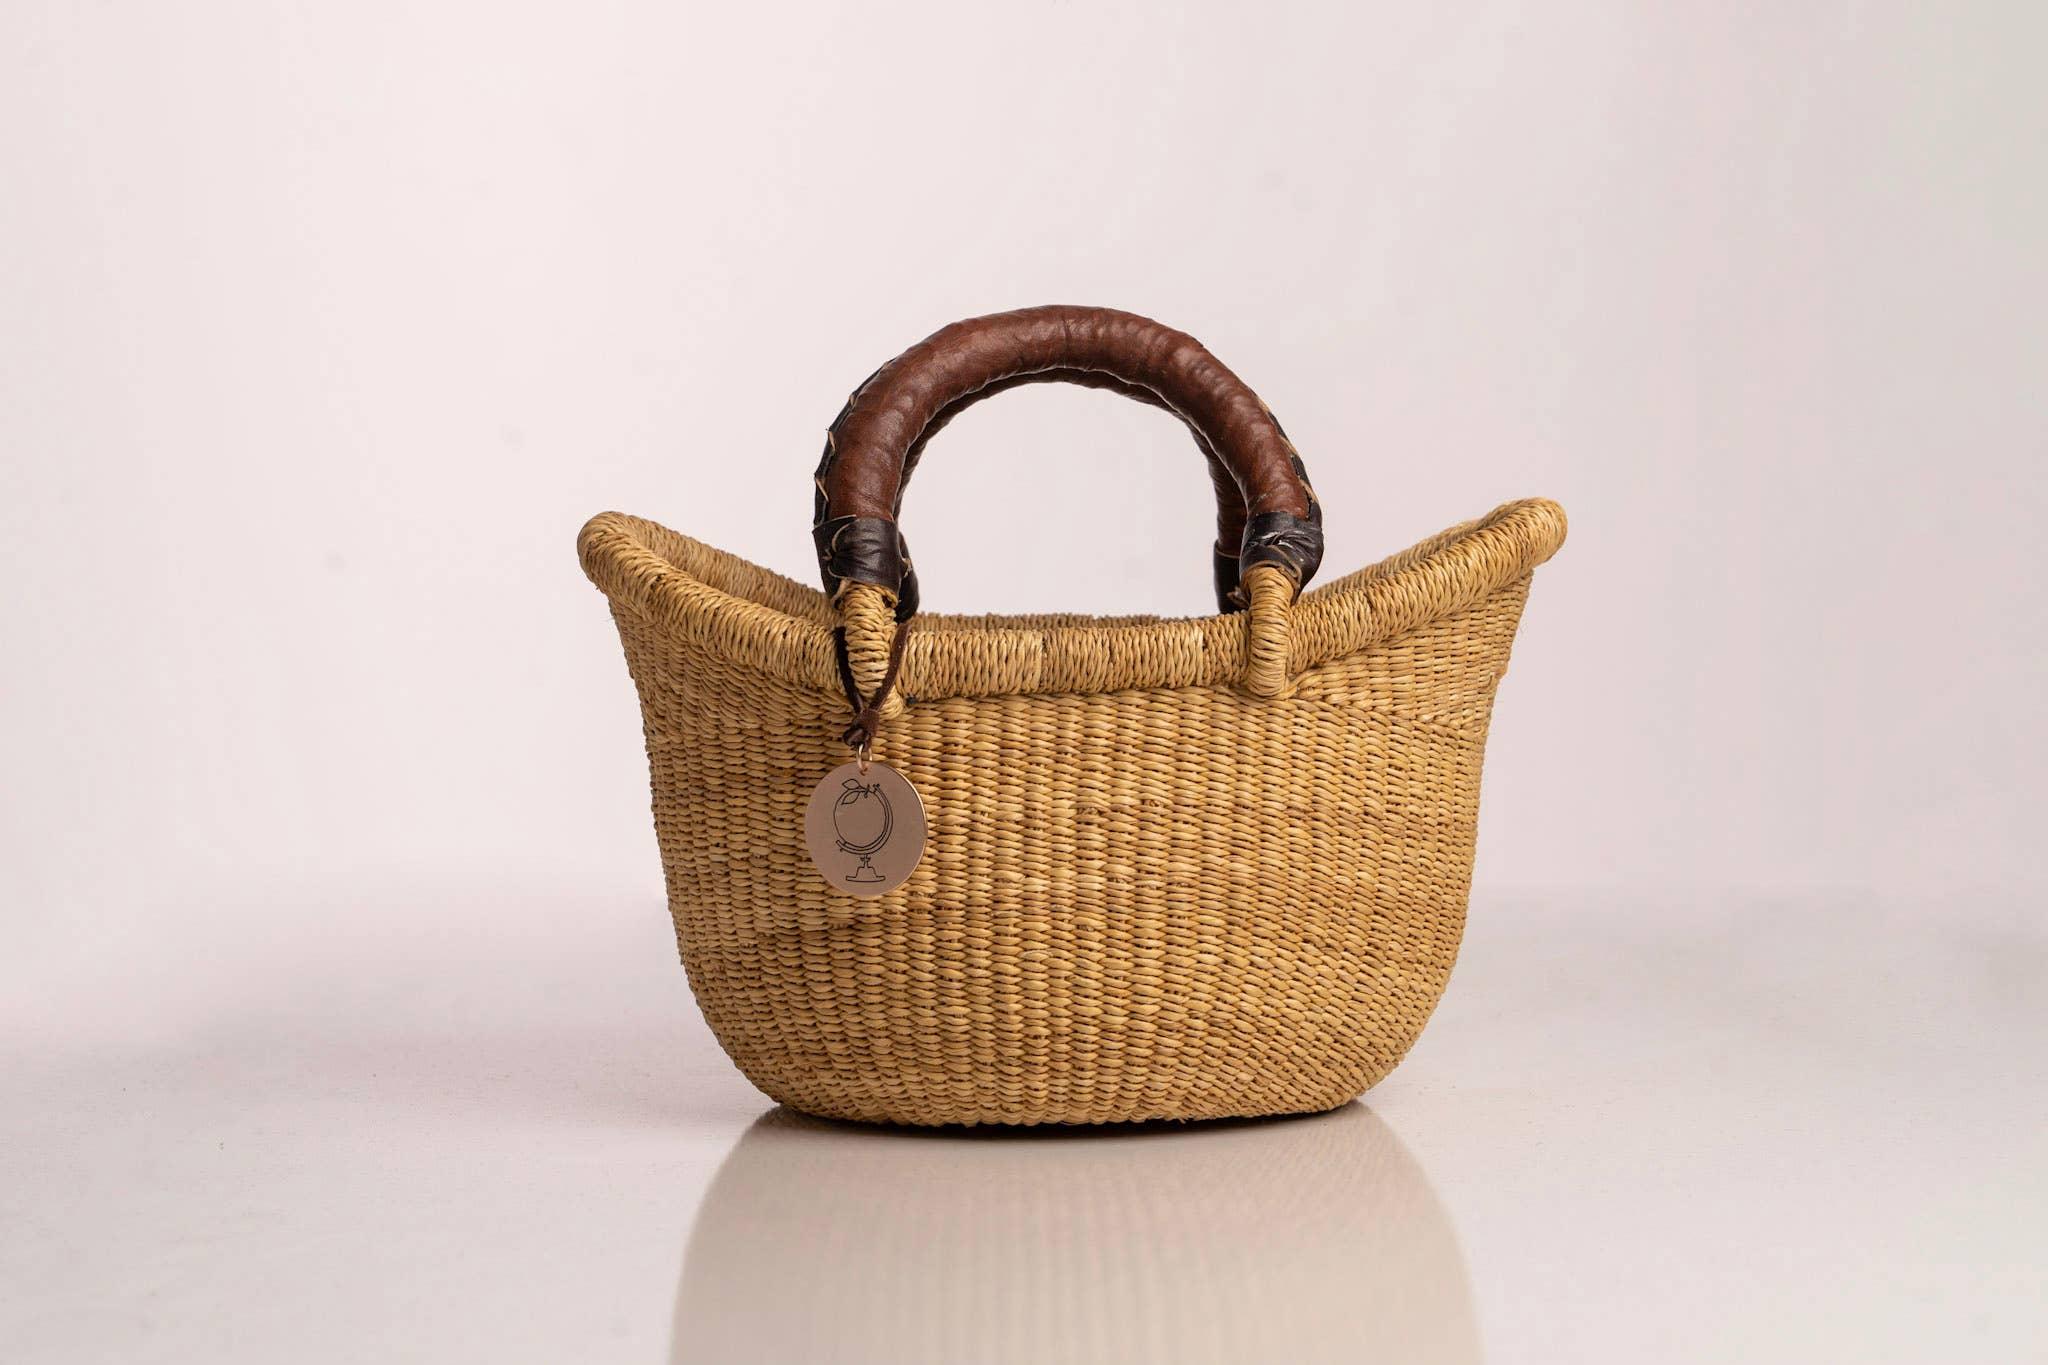 Sonder & Holliday- The Victoria Basket - Style No. 1 Natural | Trada Marketplace